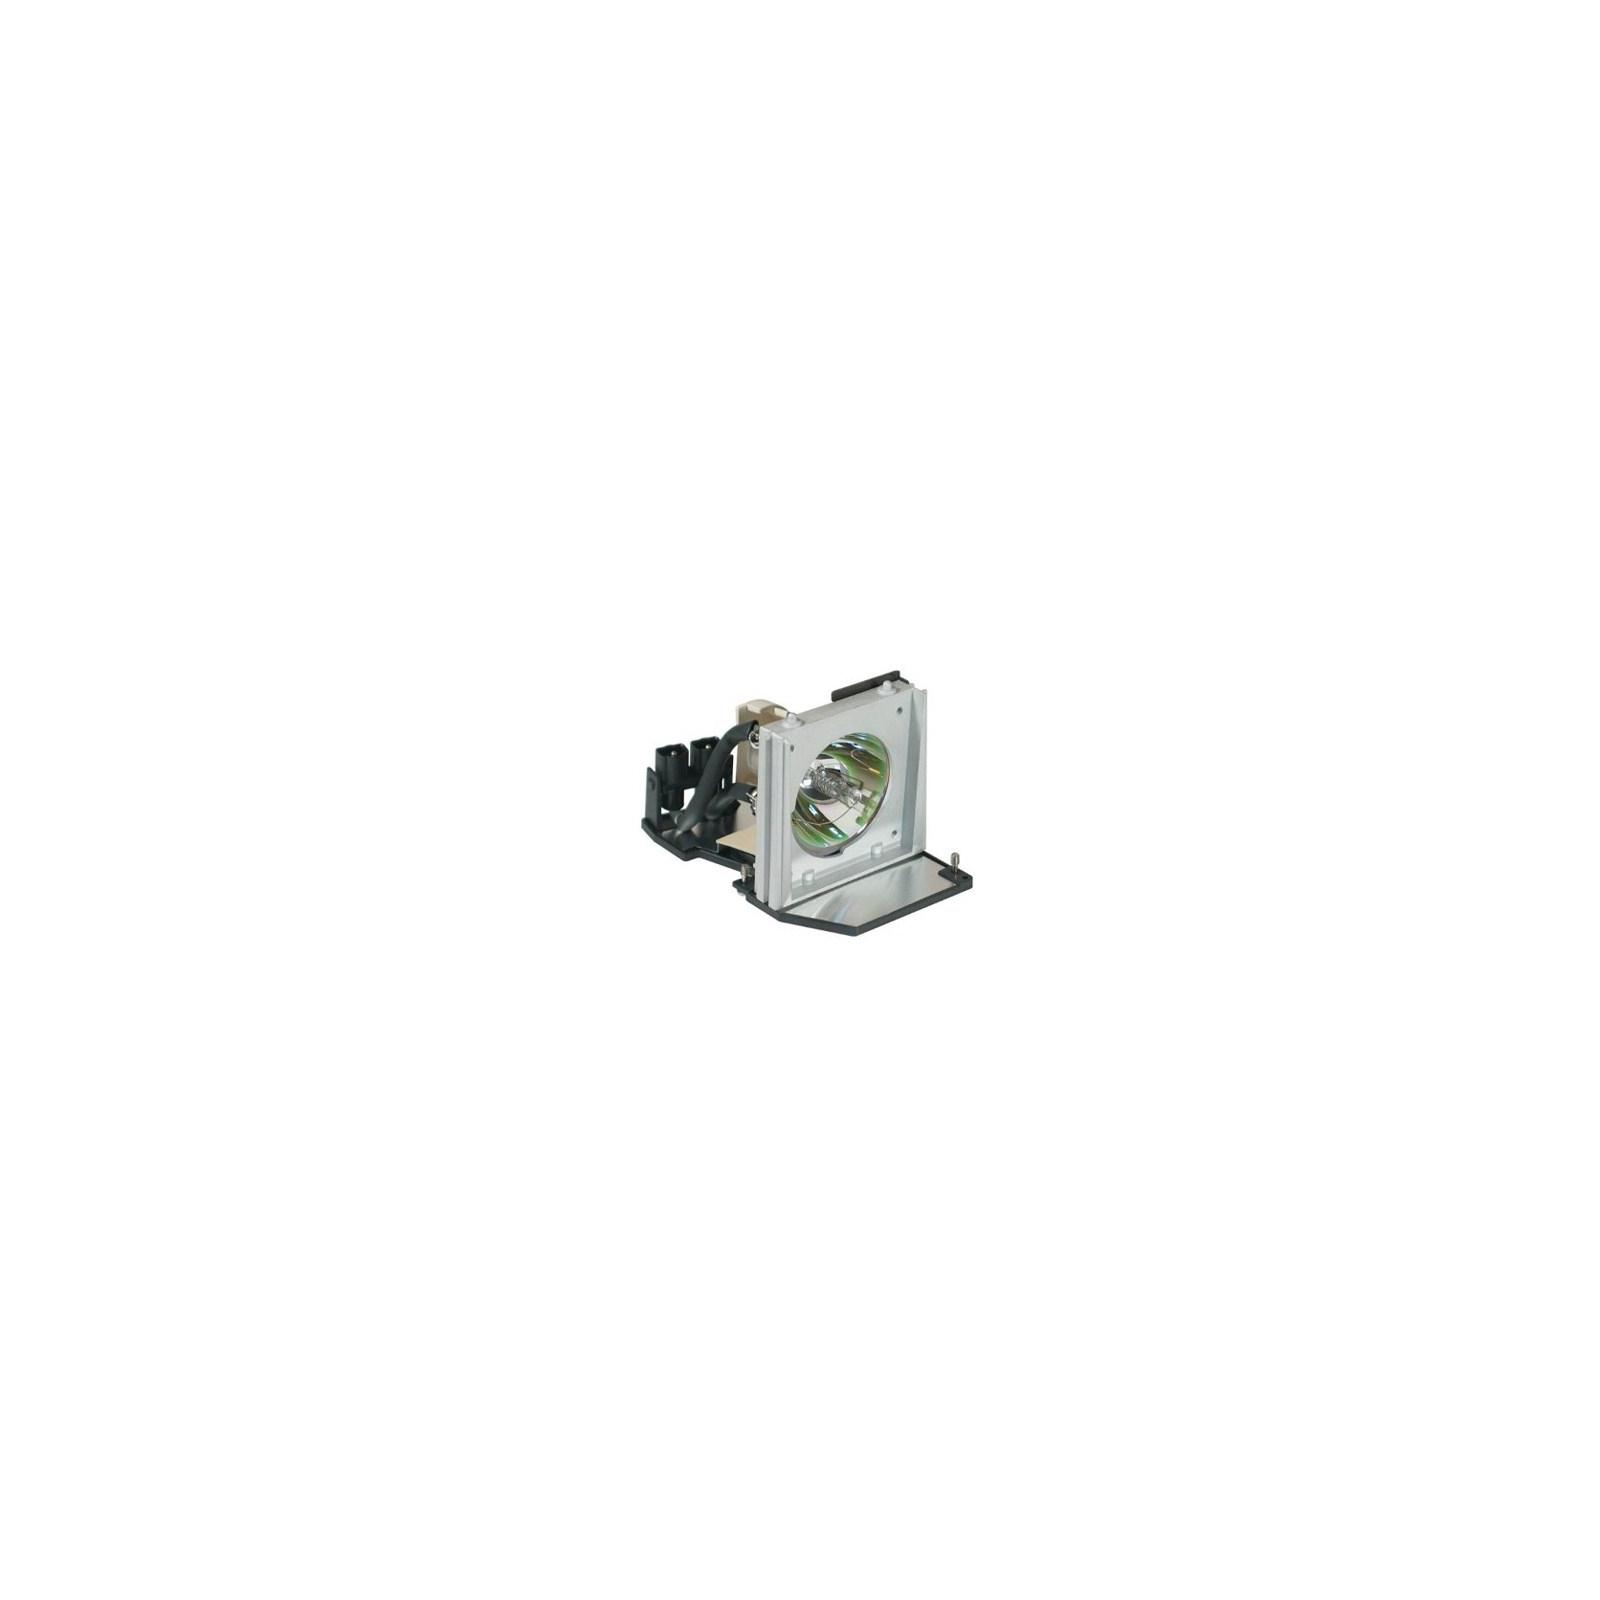 Лампа проектора Acer PD726/PD726W/PW730/PD727/PD727W (EC.J2901.001)